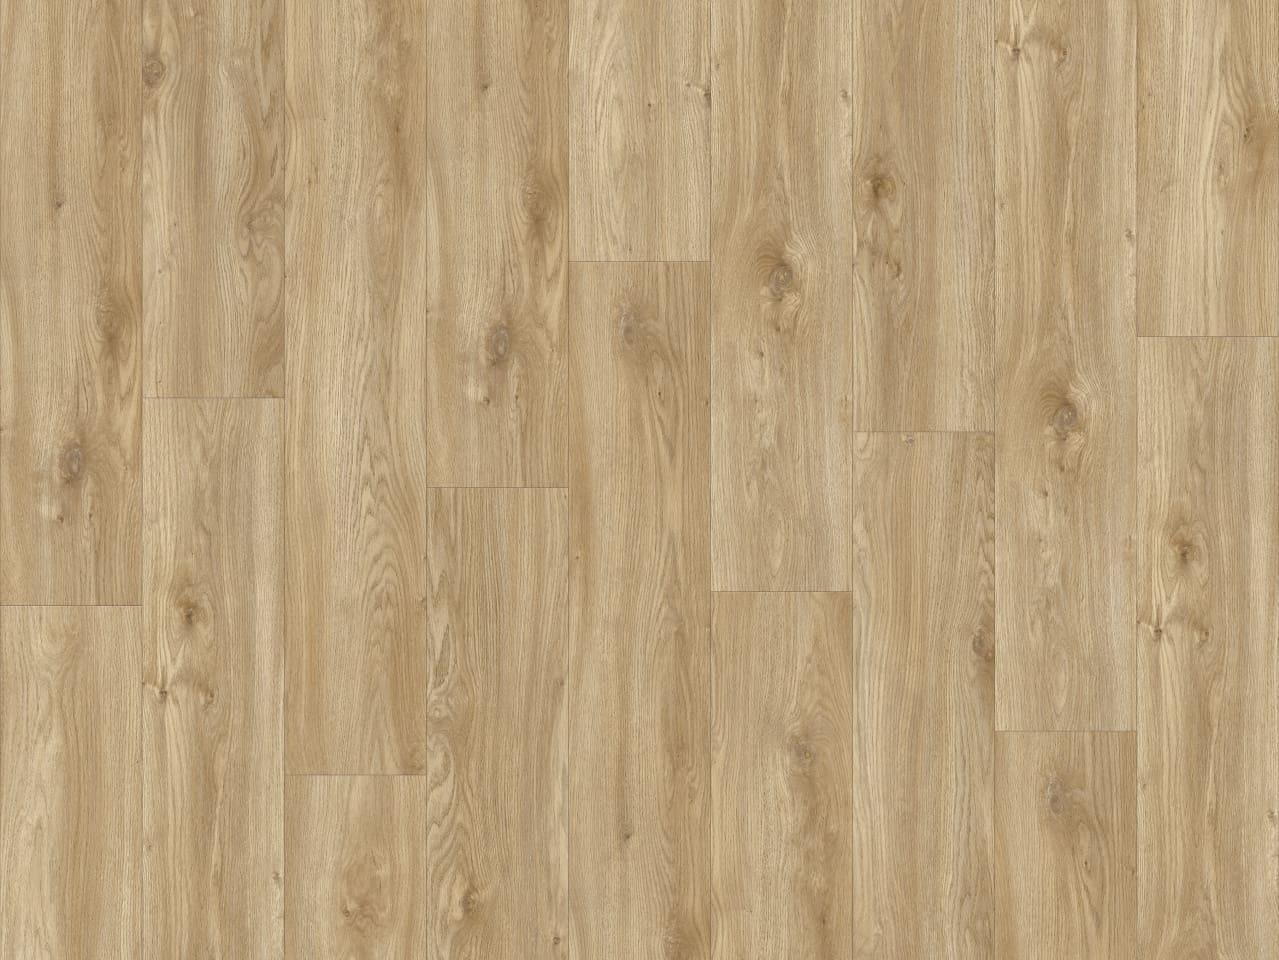 Виниловый ламинат Moduleo - Impress Sierra Oak (58346)